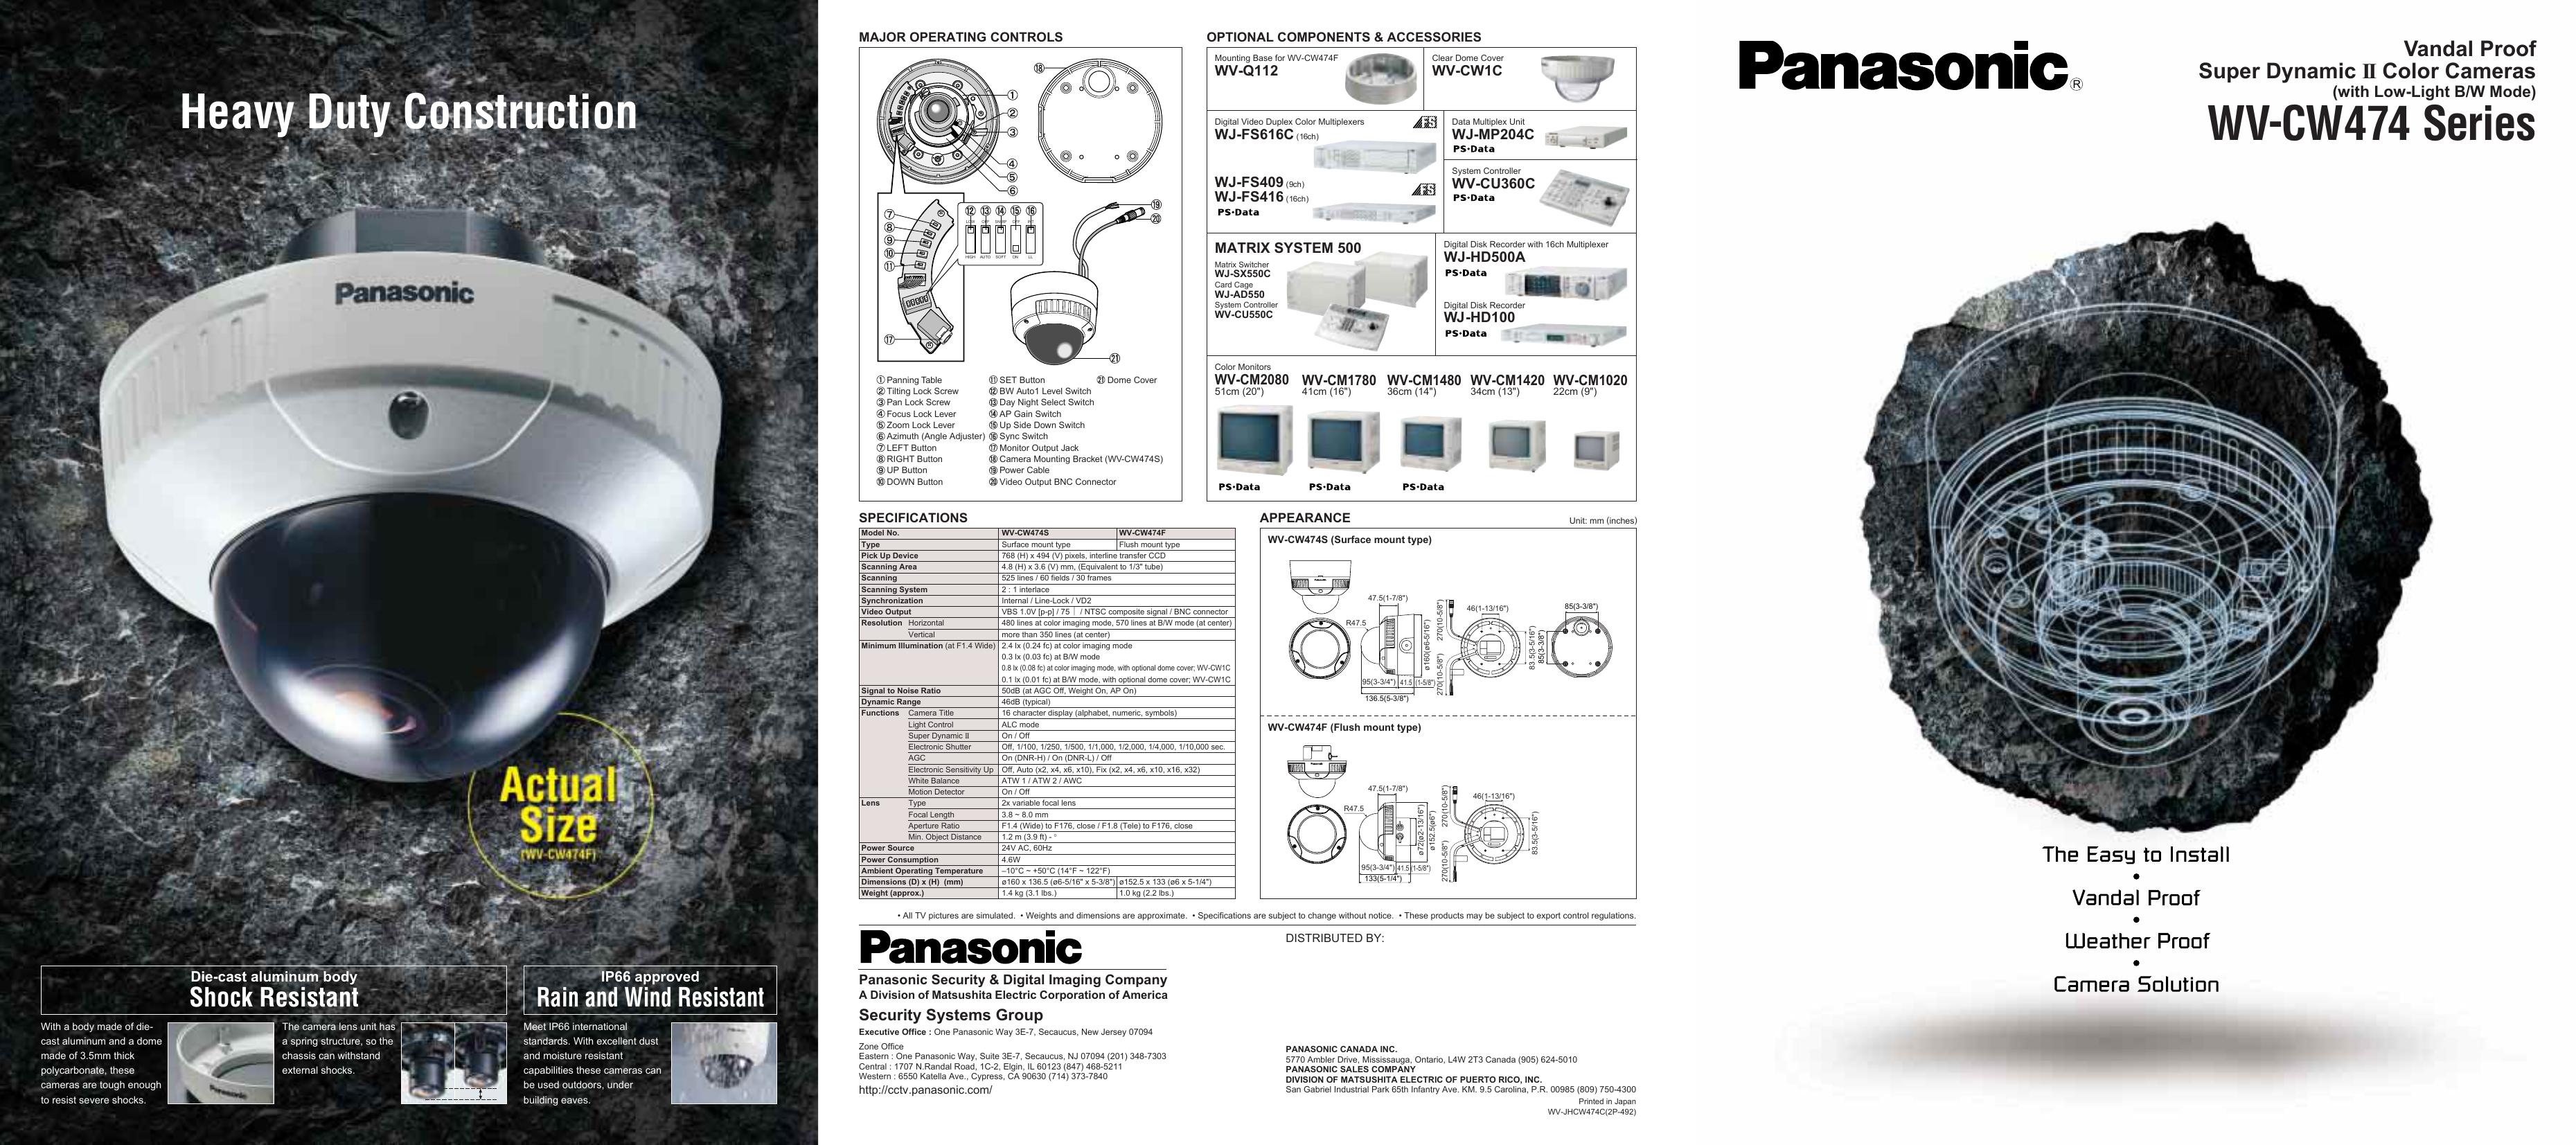 Panasonic Super Dynamic II Color CCTV Camera WV-CW474F